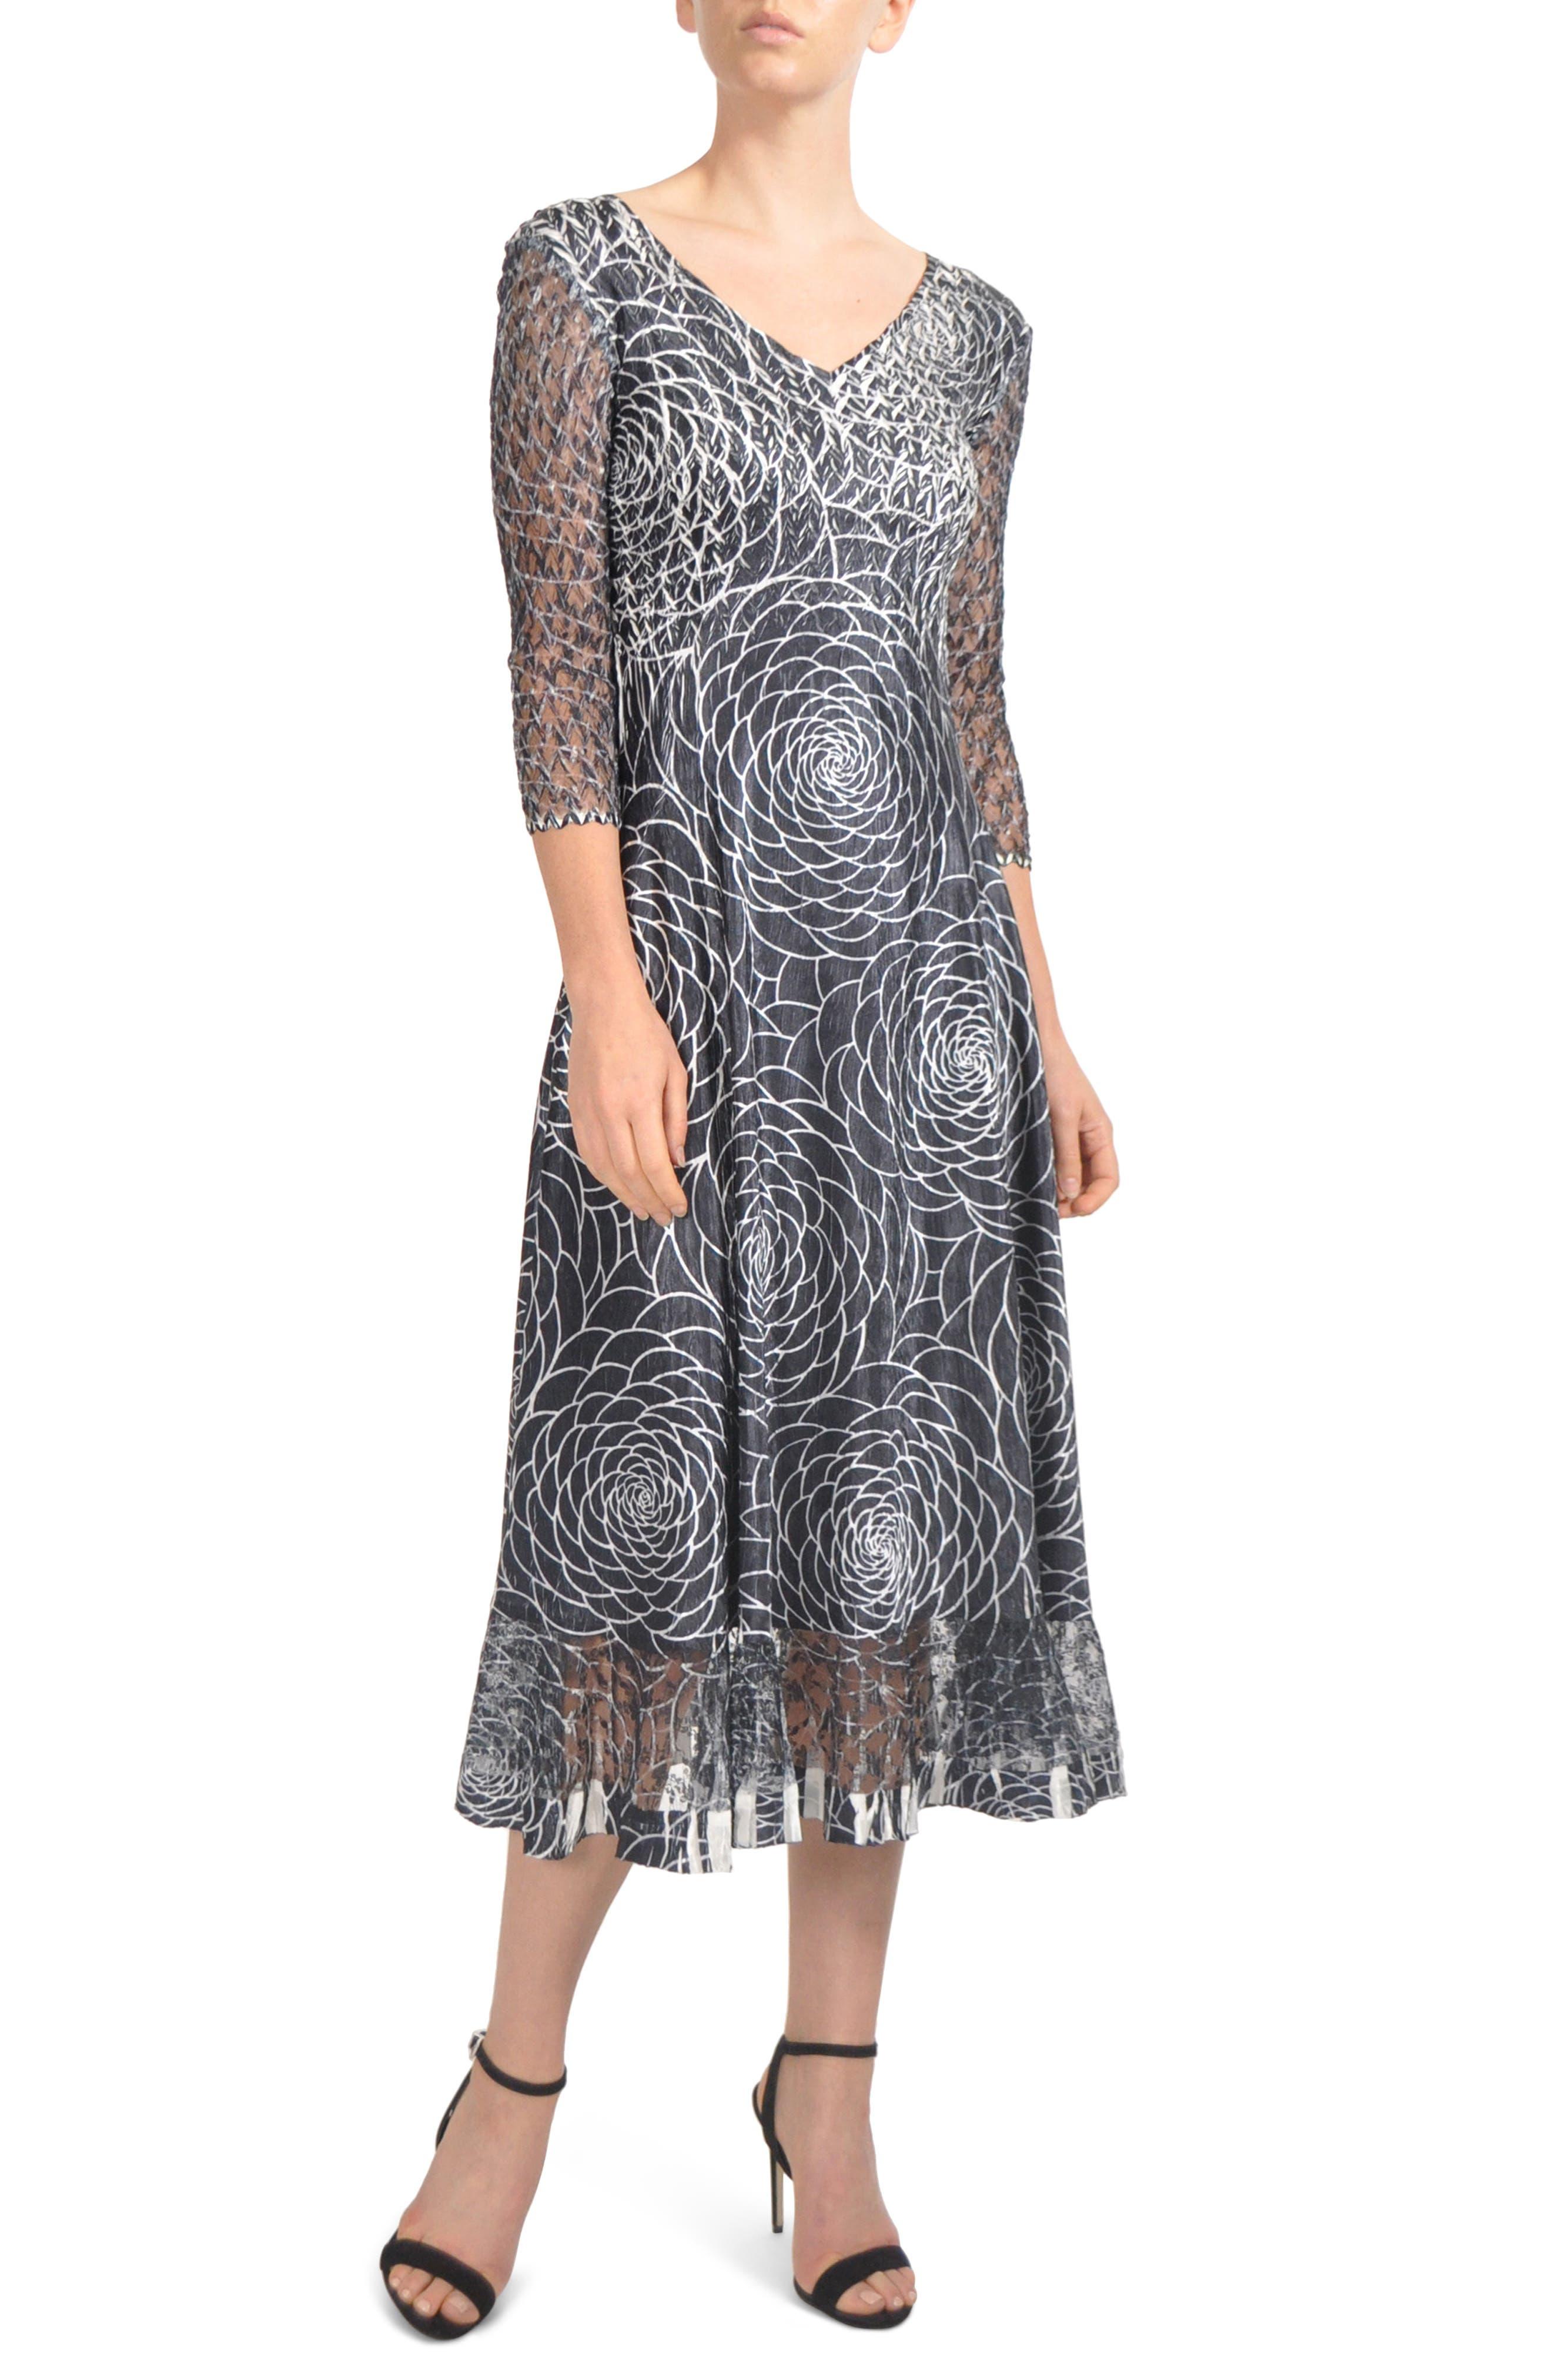 Main Image - Komarov Charmeuse & Lace Midi Dress (Regular & Petite)